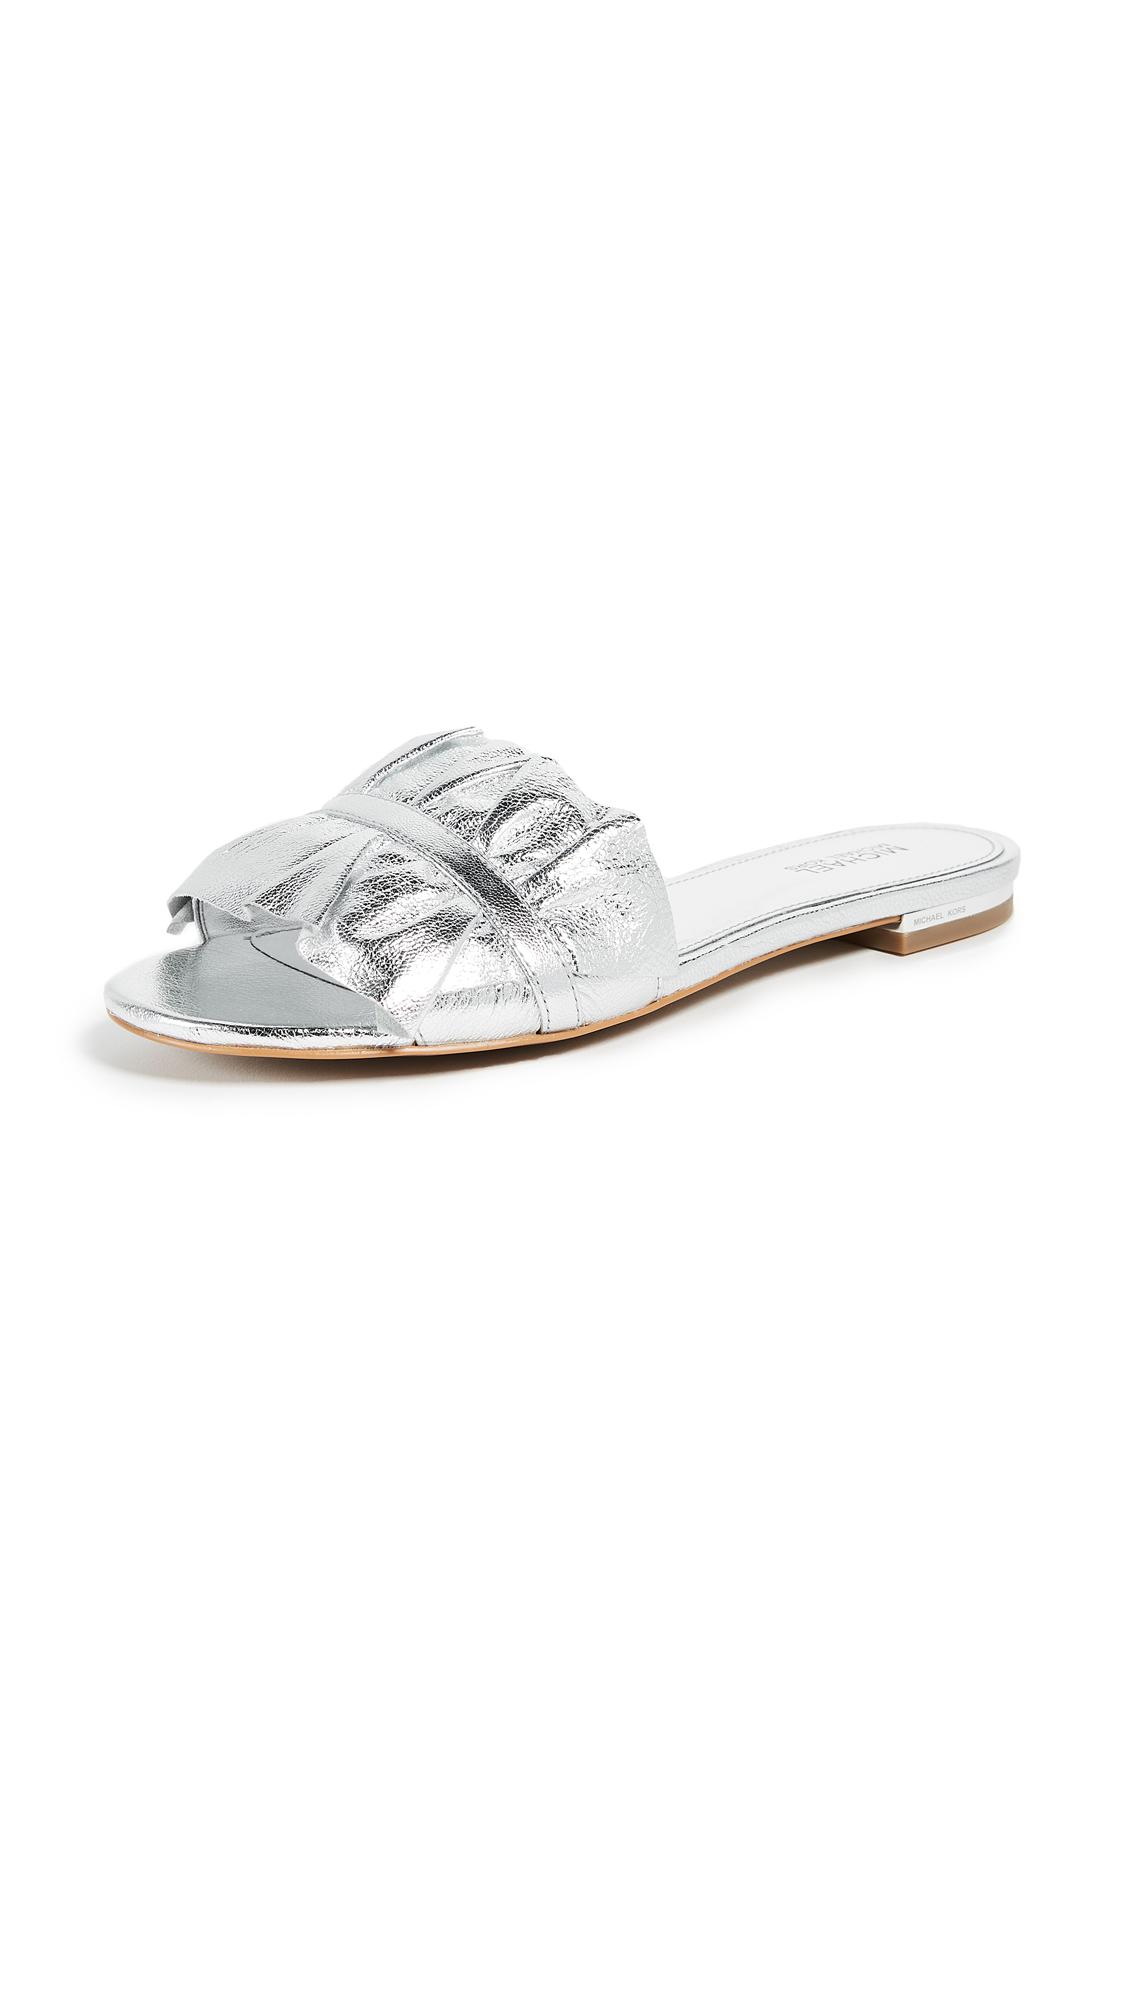 MICHAEL Michael Kors Bella Ruffle Slides - Silver